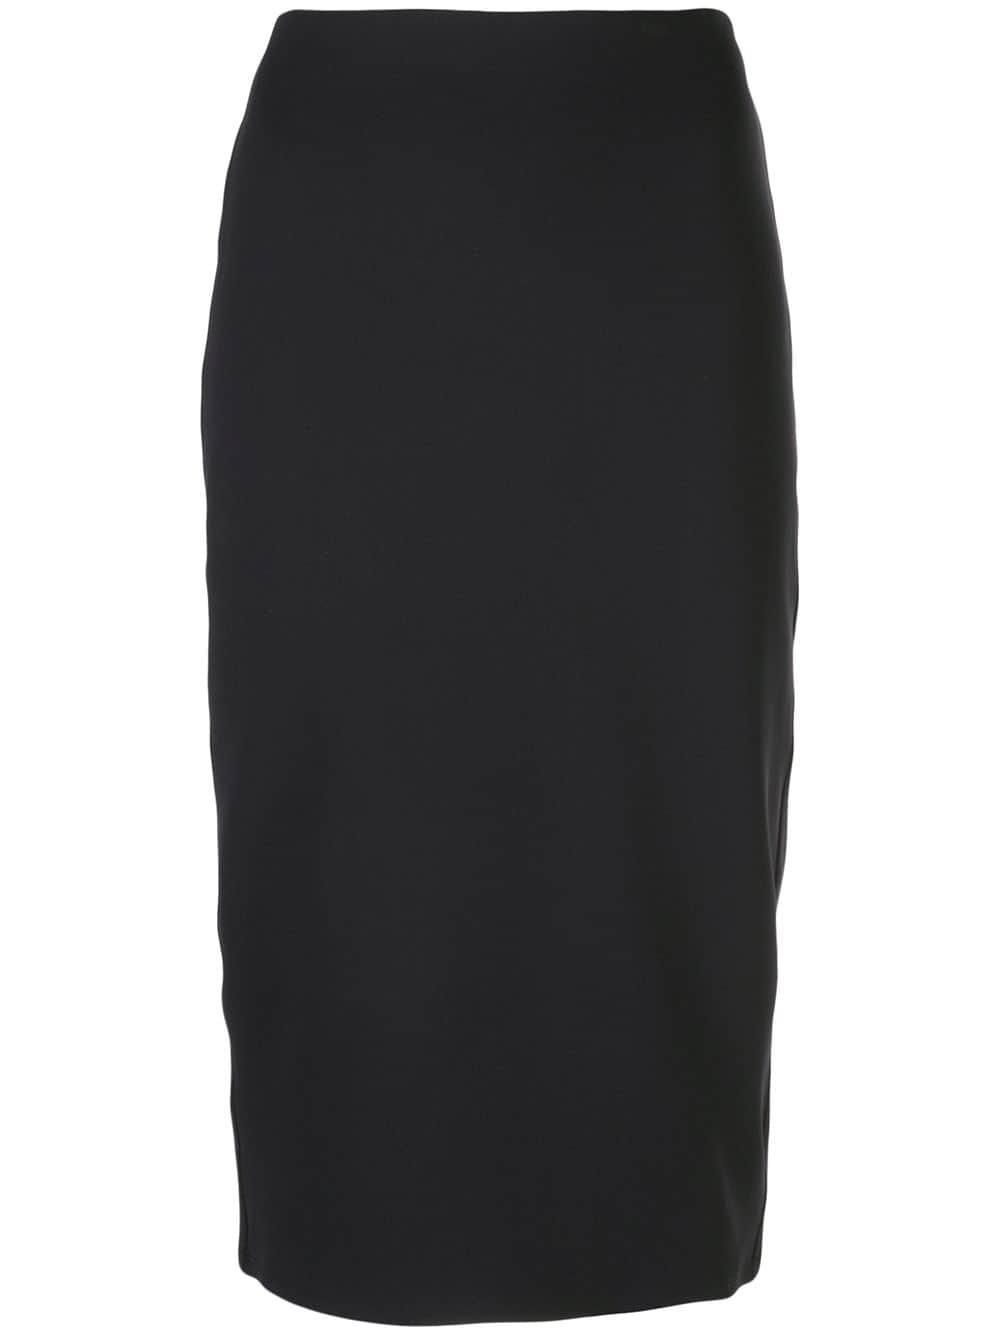 The Row юбка-карандаш с завышенной талией